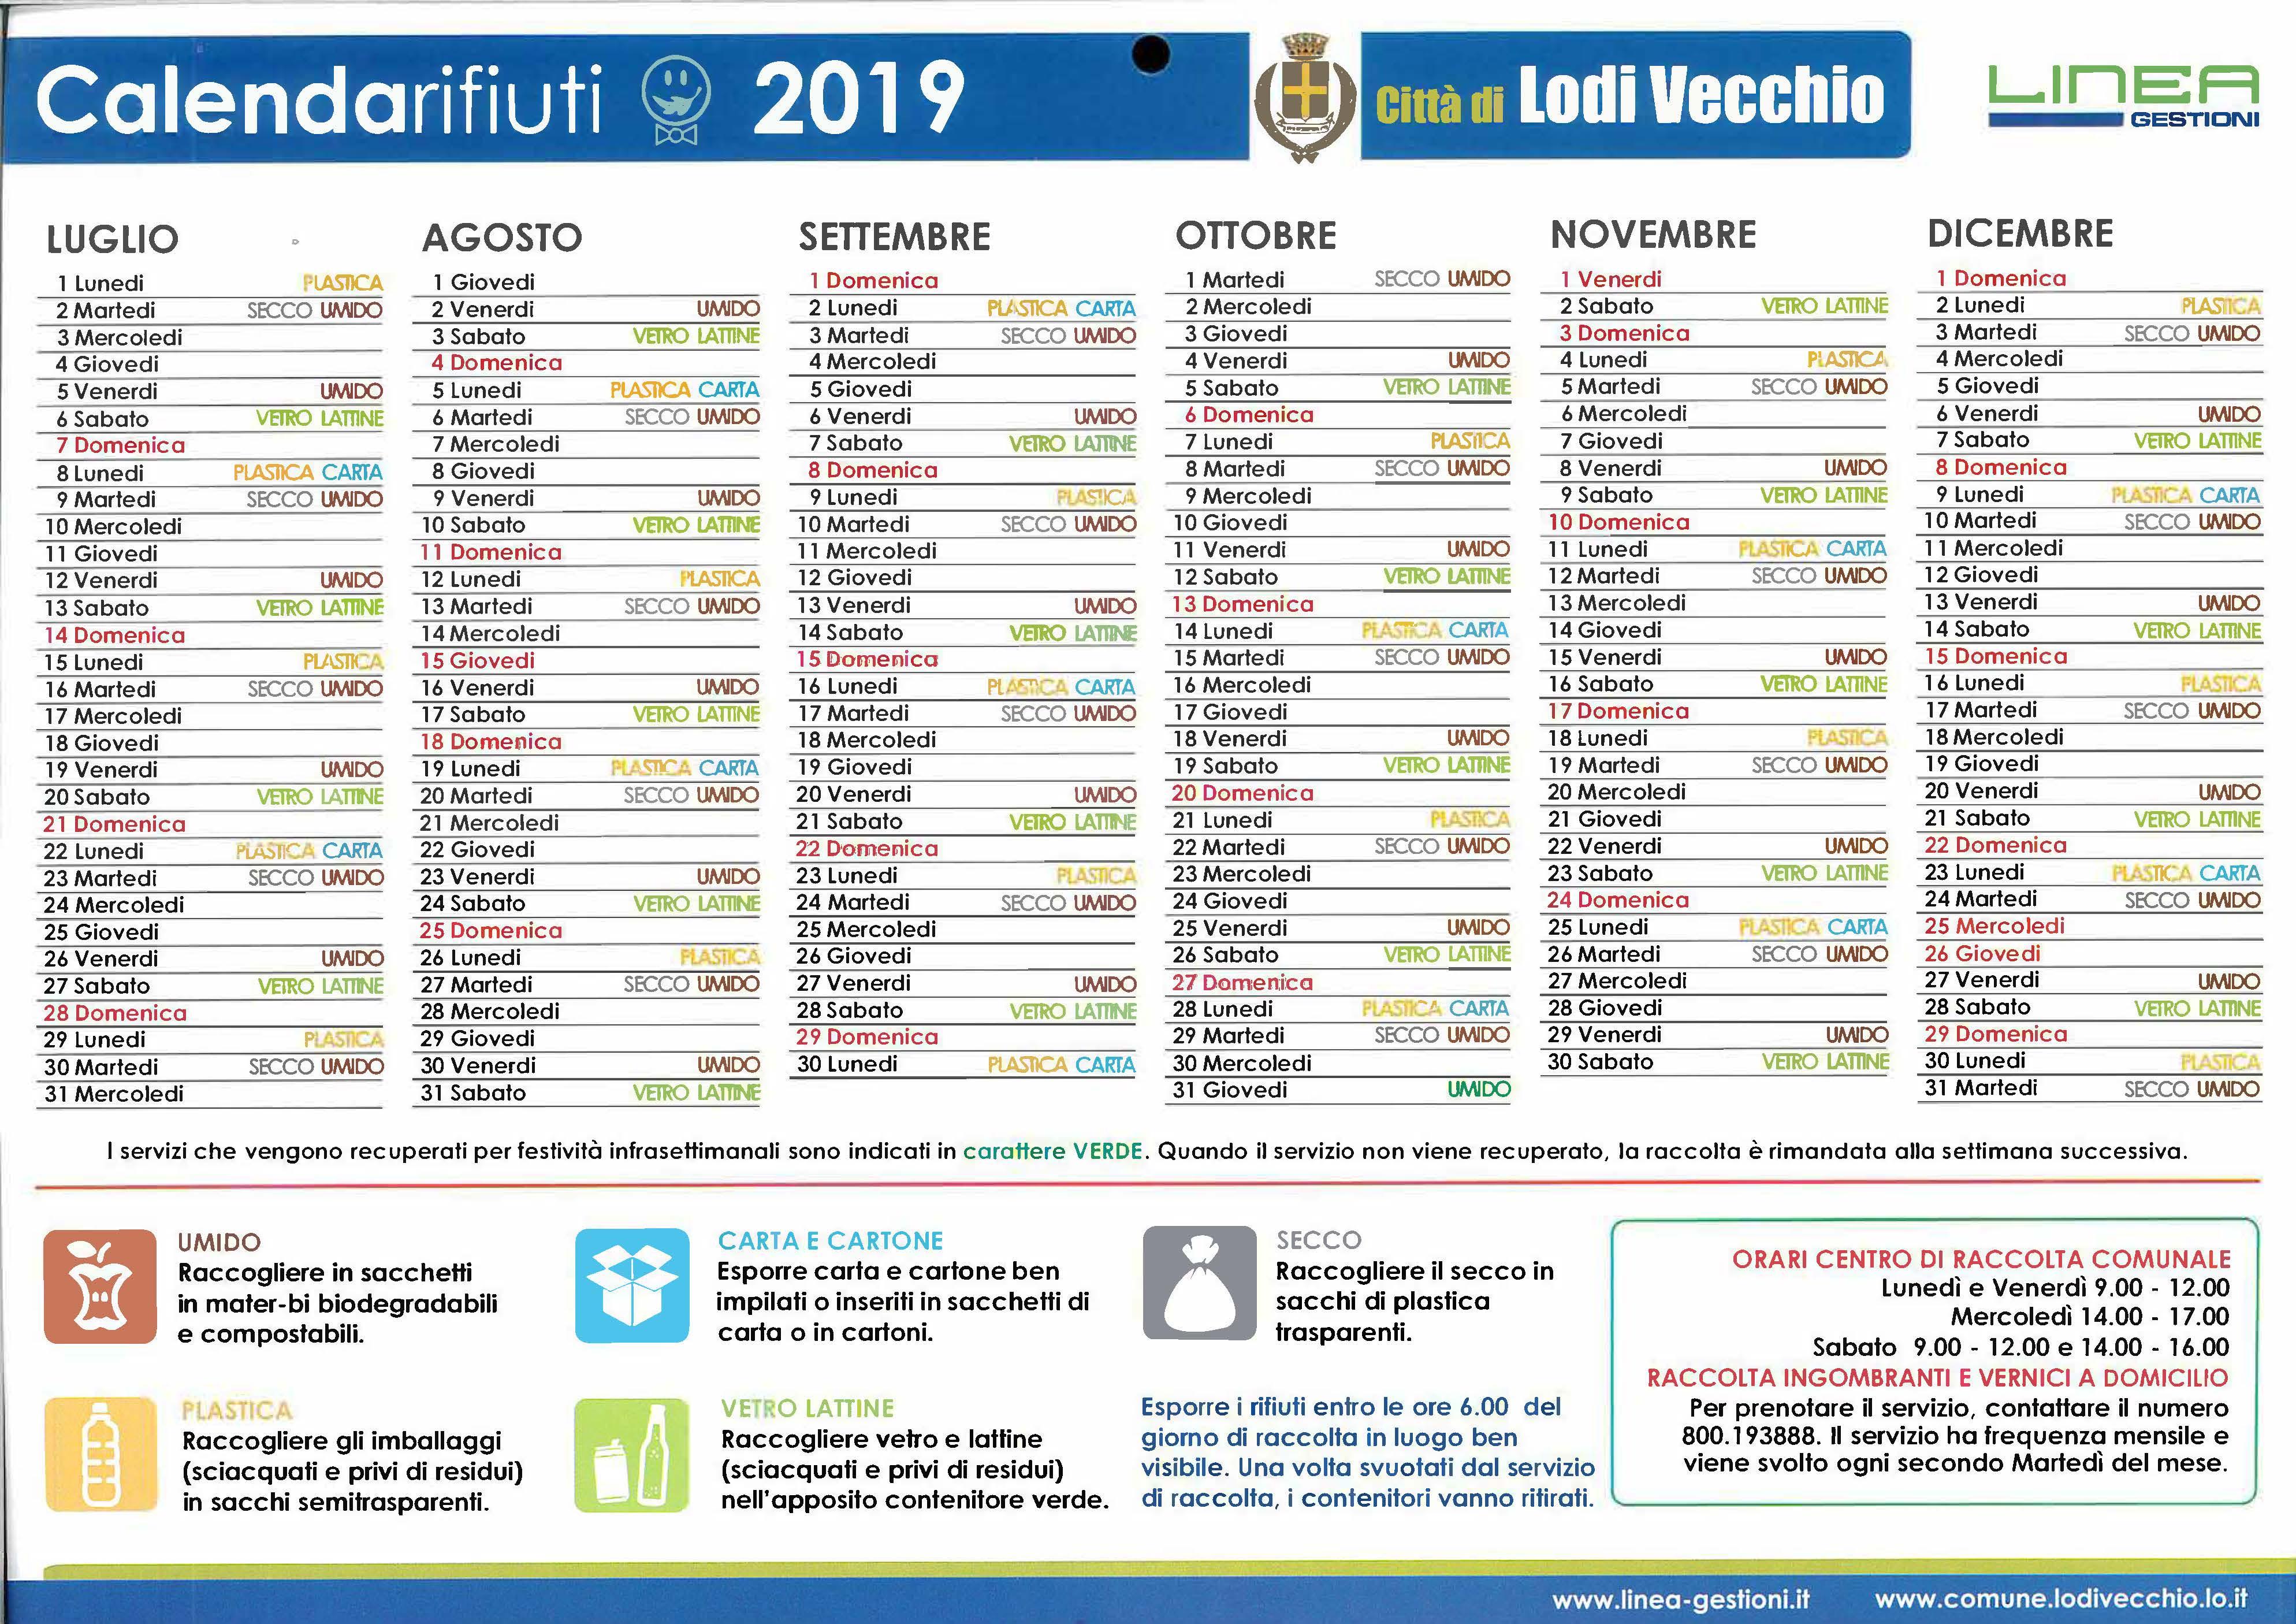 Calendario rifiuti 2019